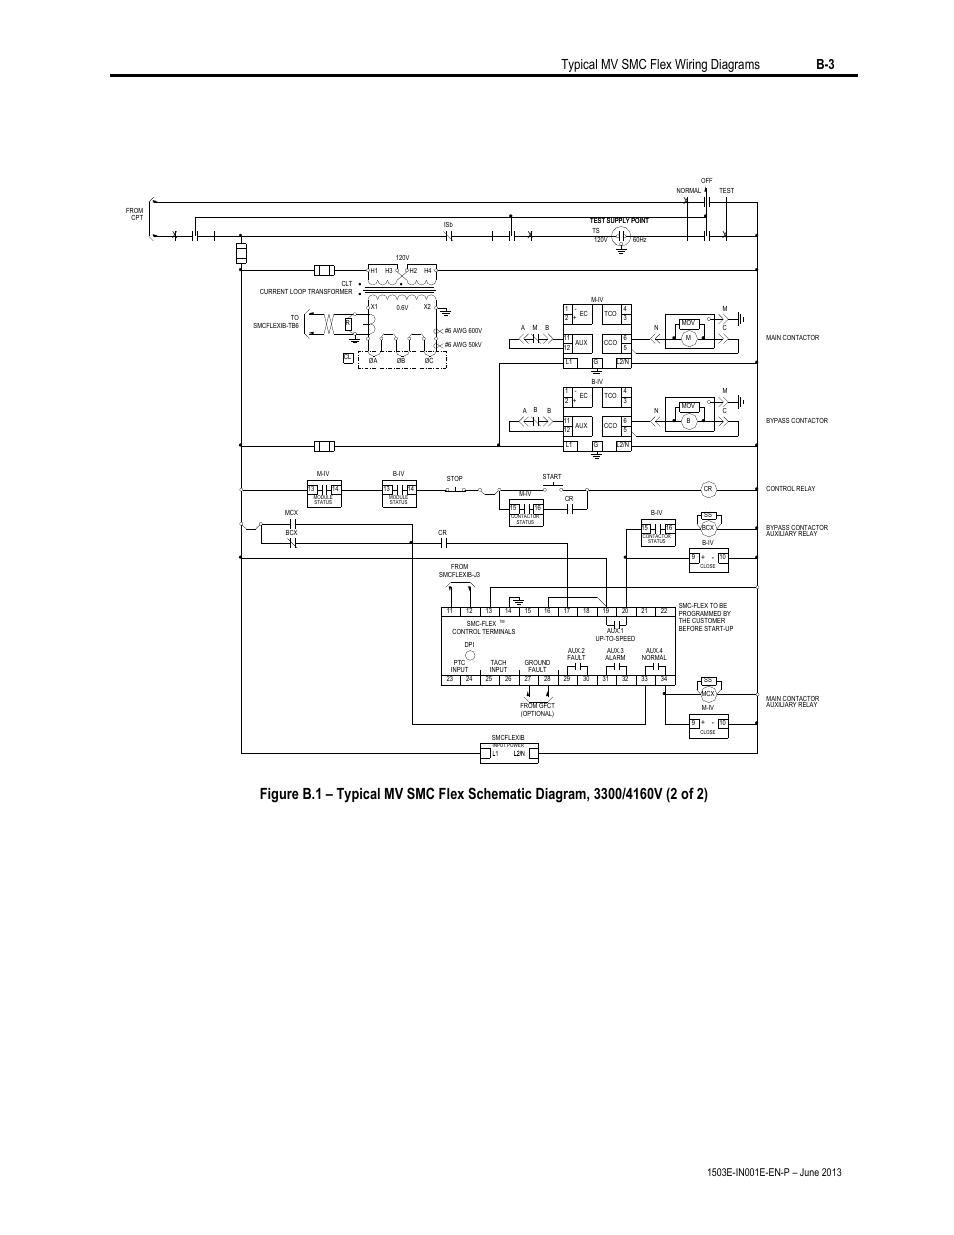 medium resolution of typical mv smc flex wiring diagrams b 3 rockwell automation mv smctypical mv smc flex wiring